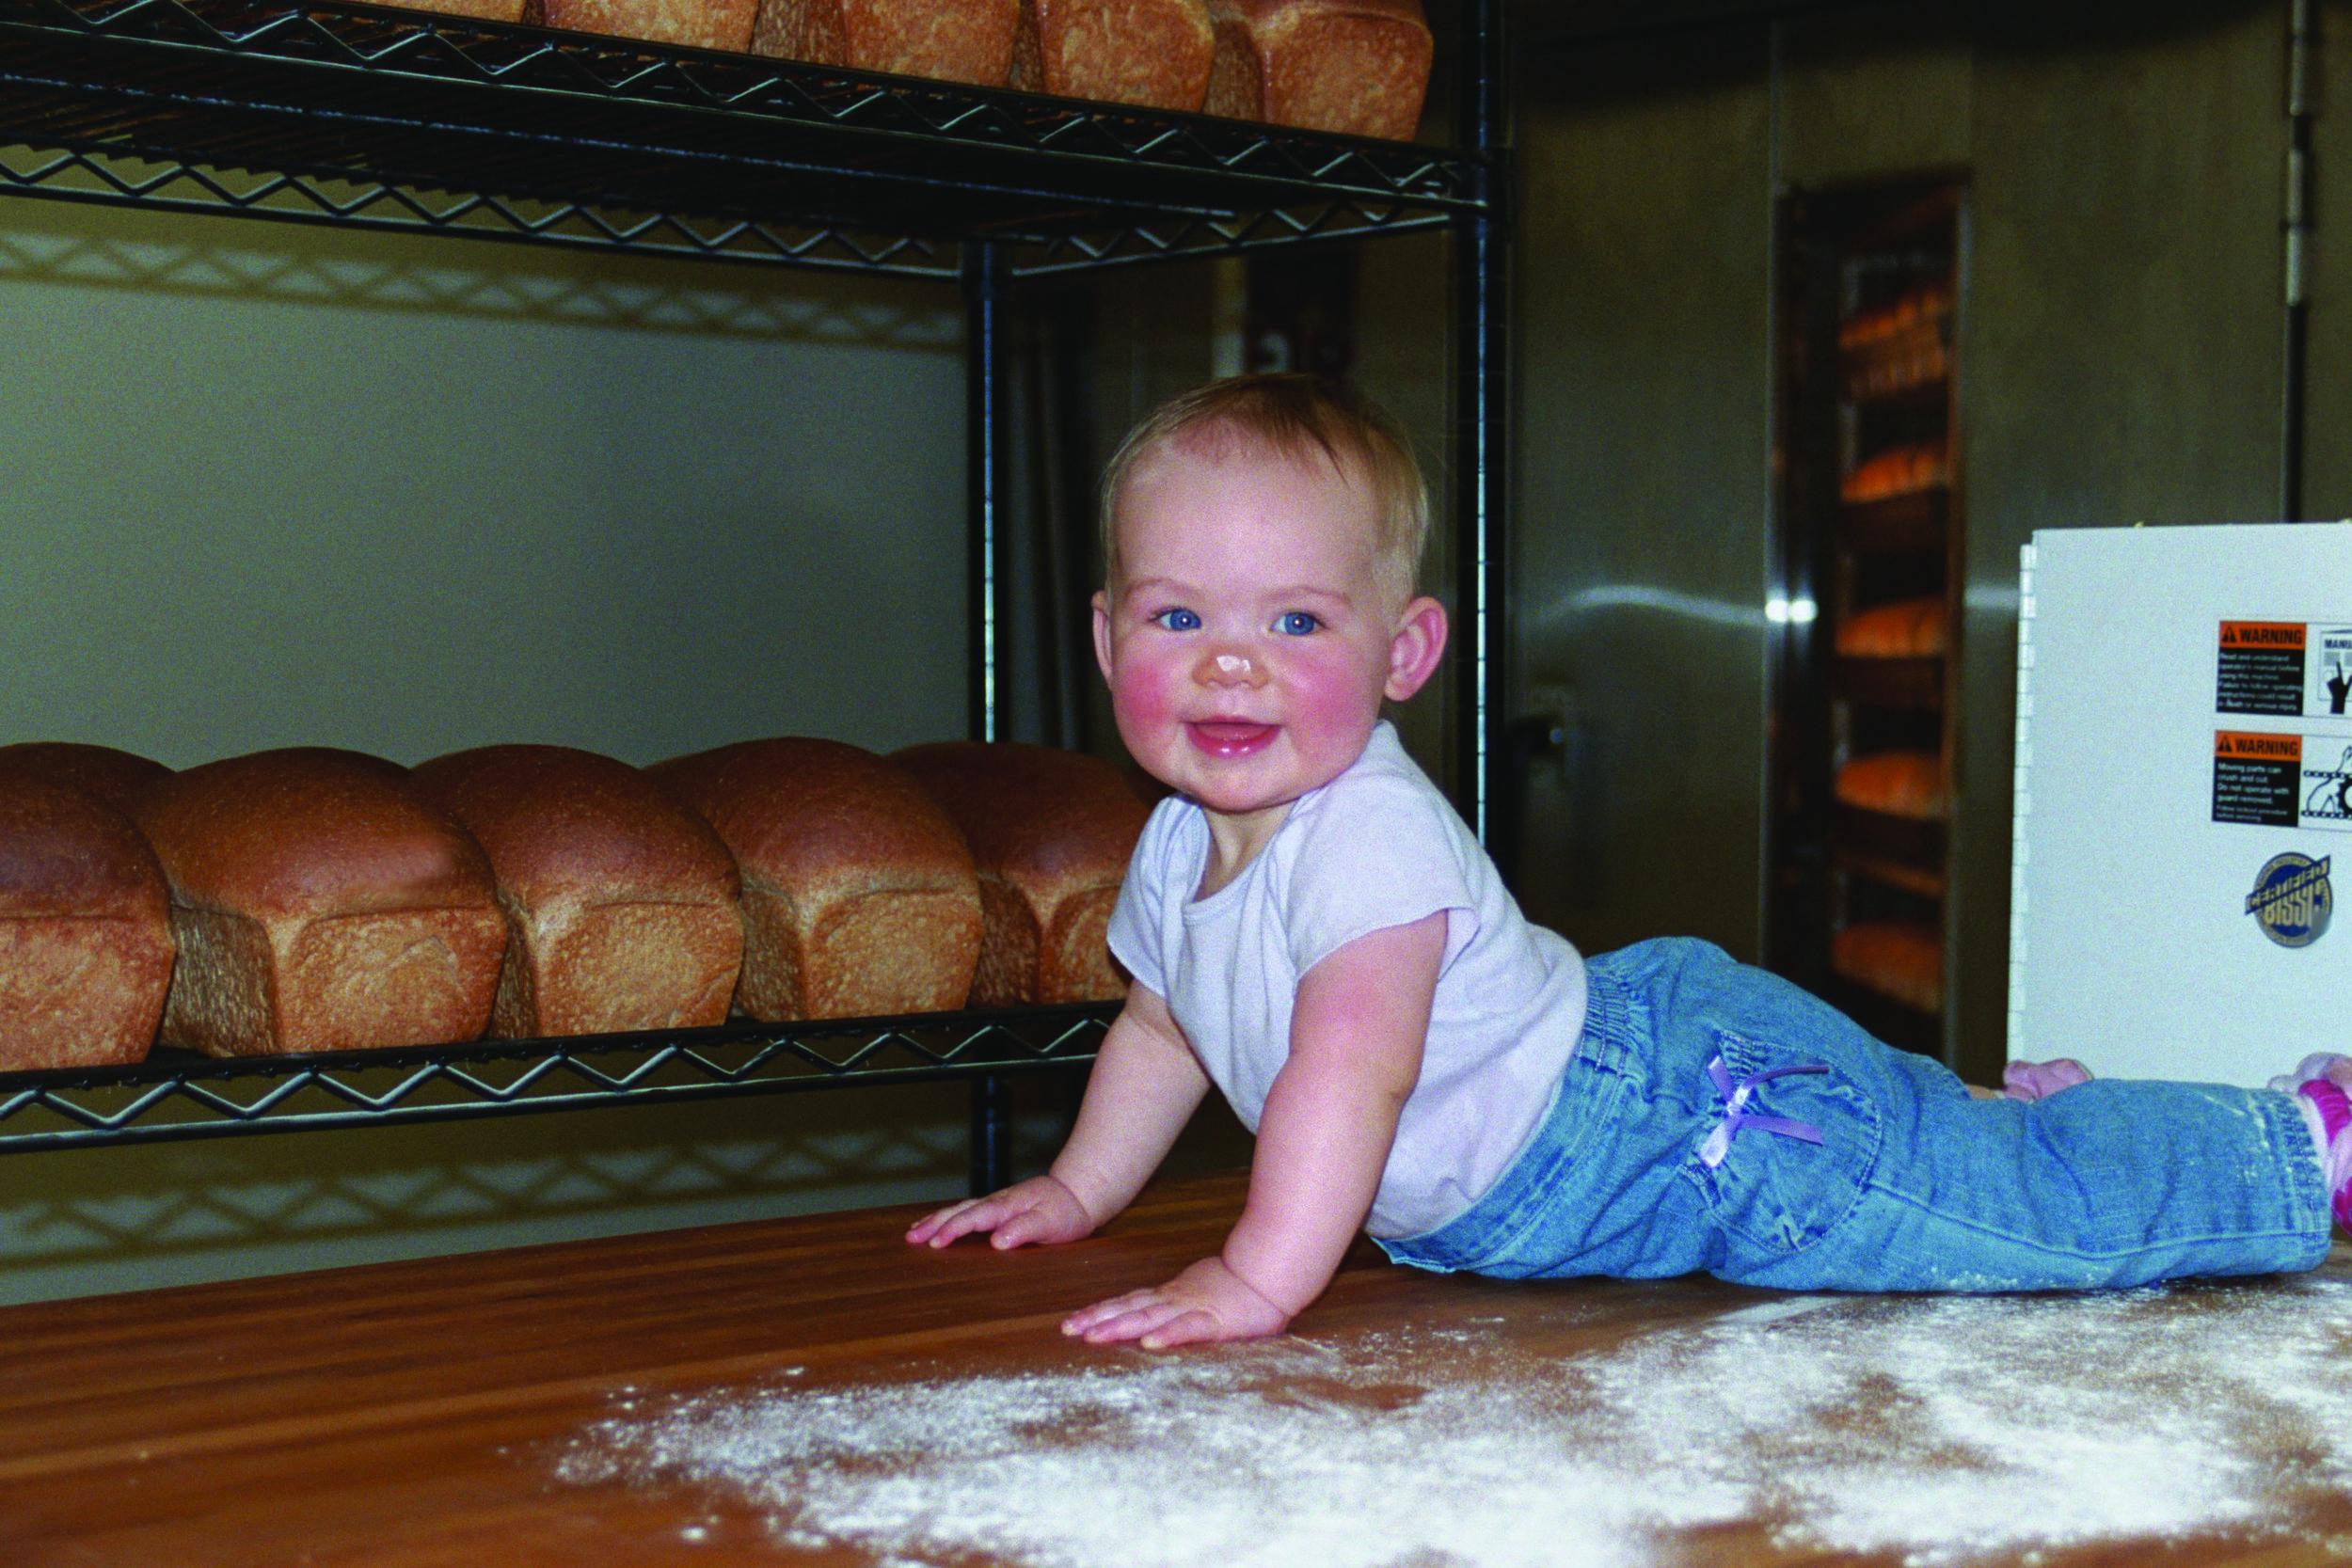 tate-w-bread-2_8457973614_o.jpg